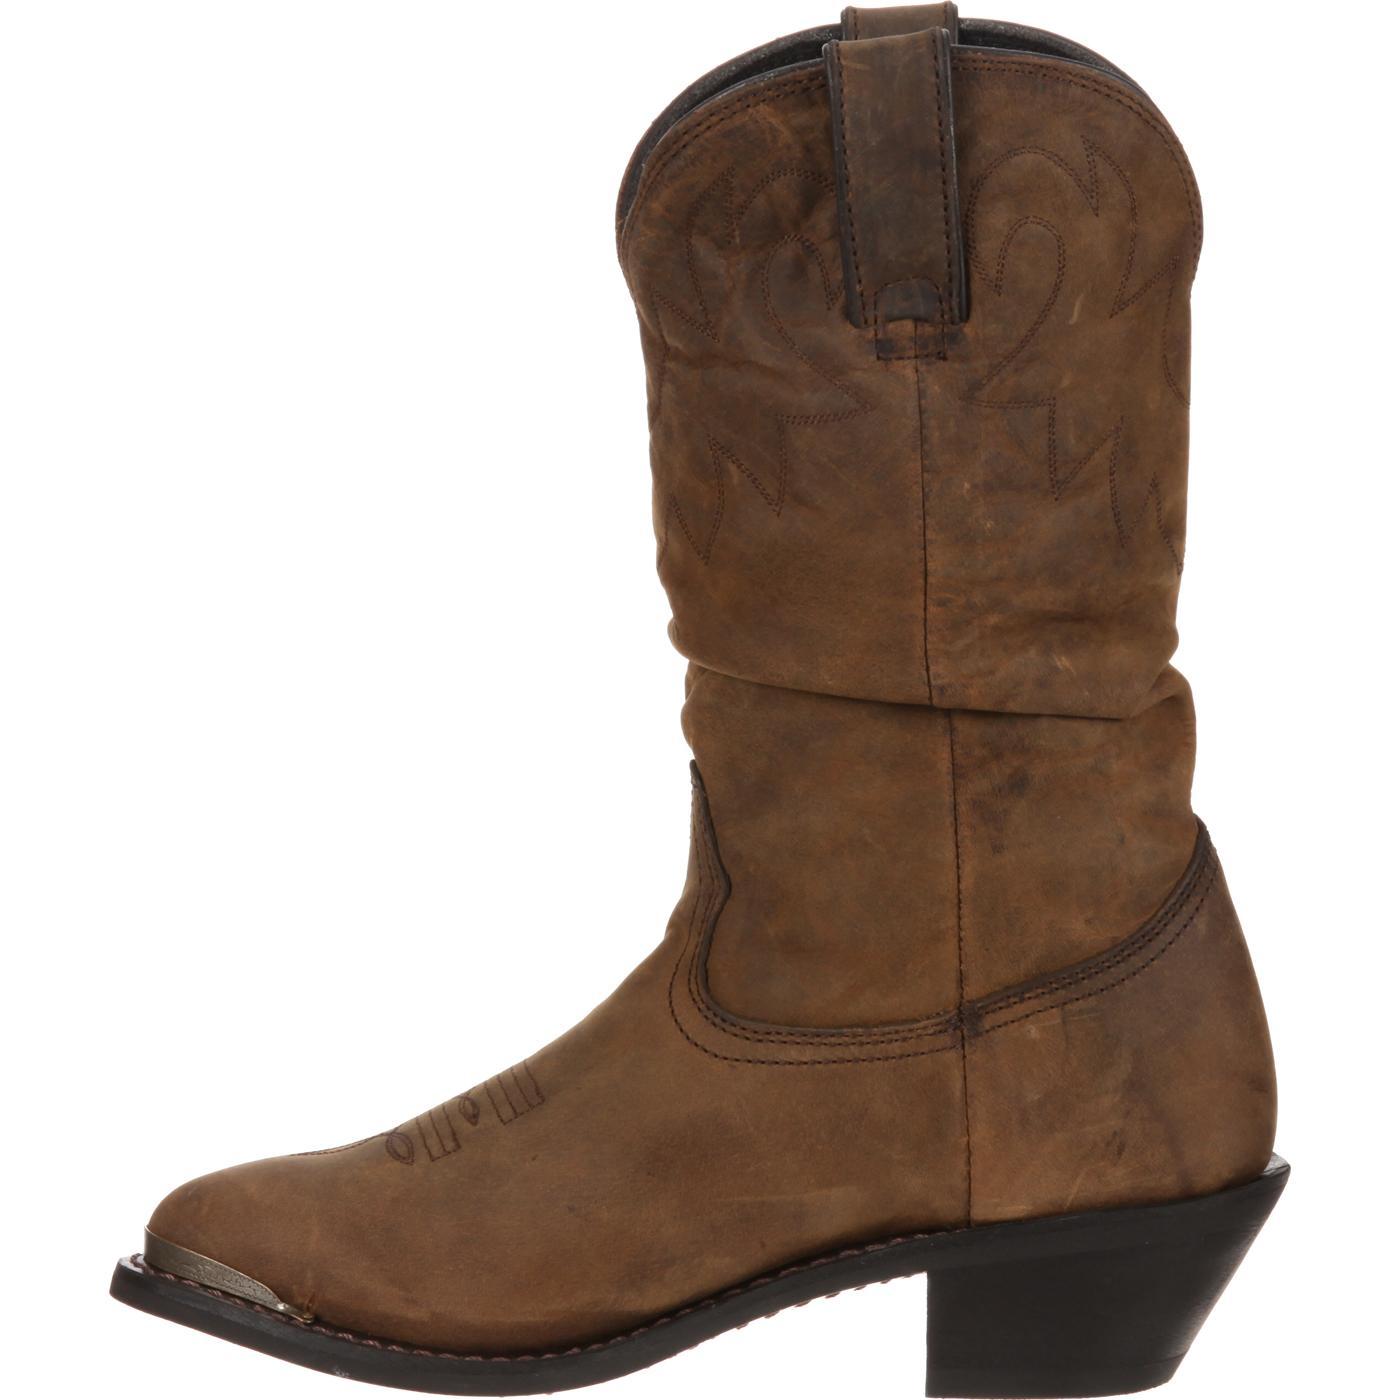 Simple NEW Durango Womenu0026#39;s Lady Rebel LET LOVE FLY Leather Western Cowboy Boots Purple | EBay